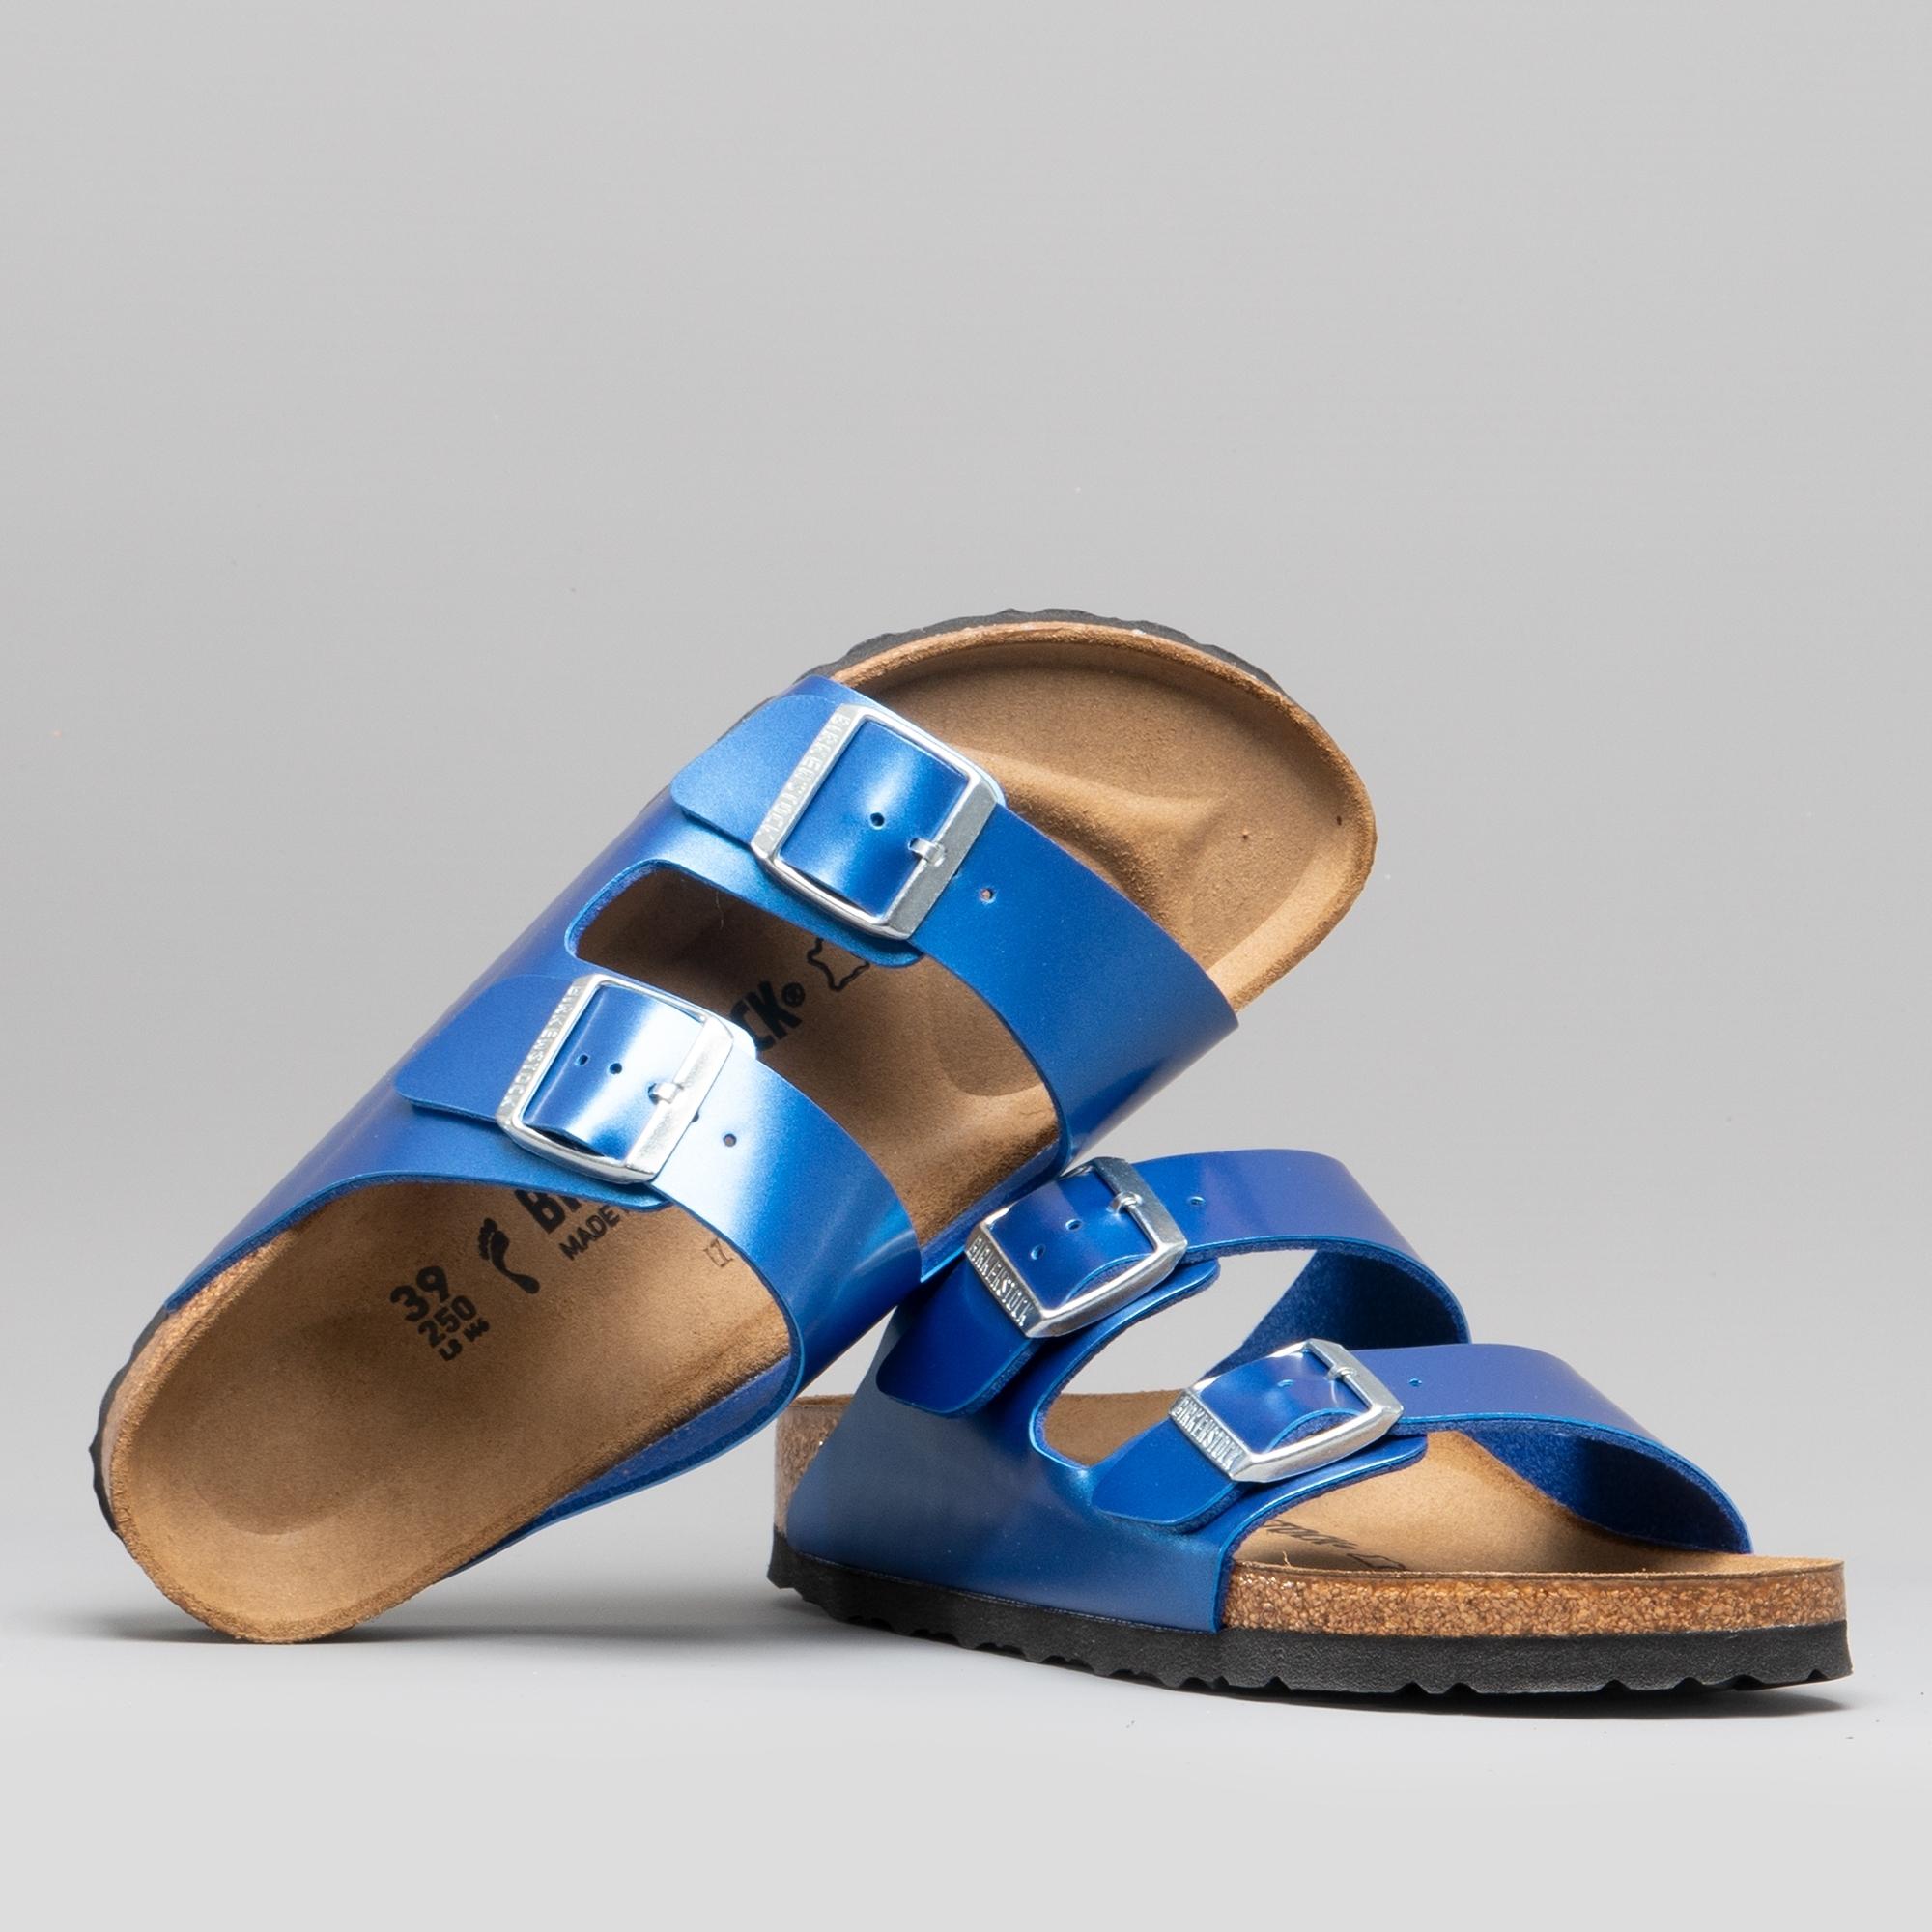 a4c440de2a98d Birkenstock ARIZONA 1012970 (Nar) Ladies Birko-Flor Two Strap Sandals Electric  Metallic Ocean   Shuperb